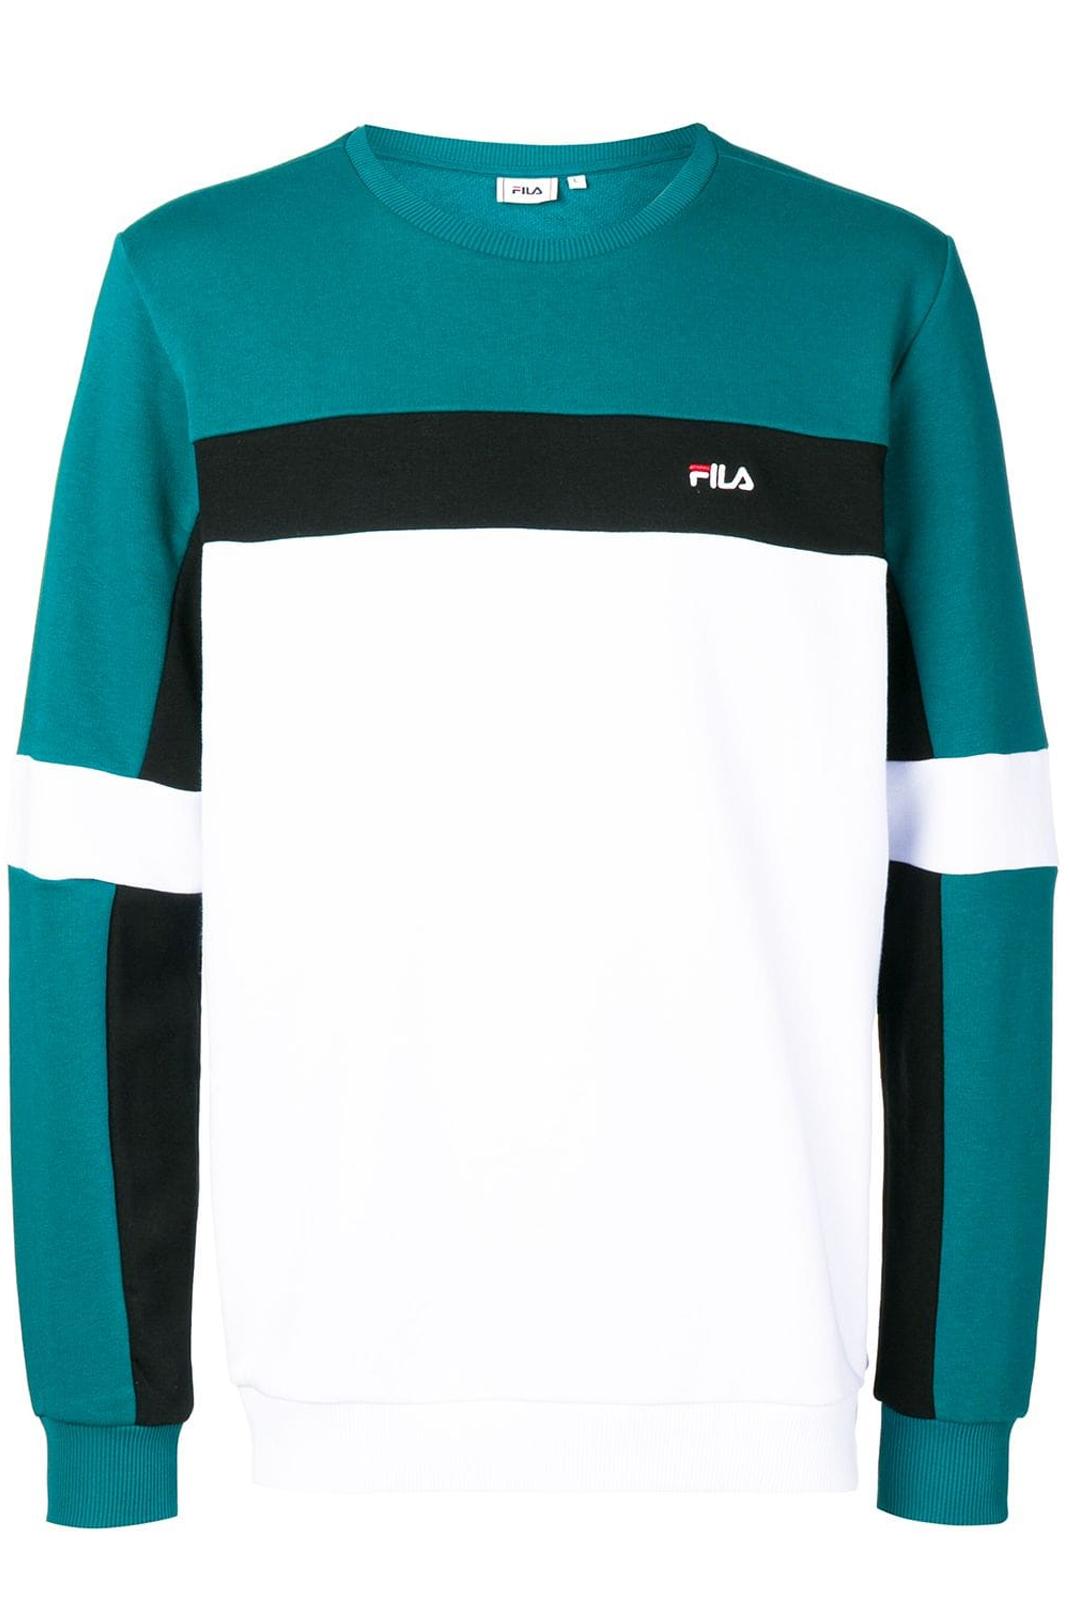 Pulls & Gilets  Fila 687165 norbin A083 shades spruce-black-bright white